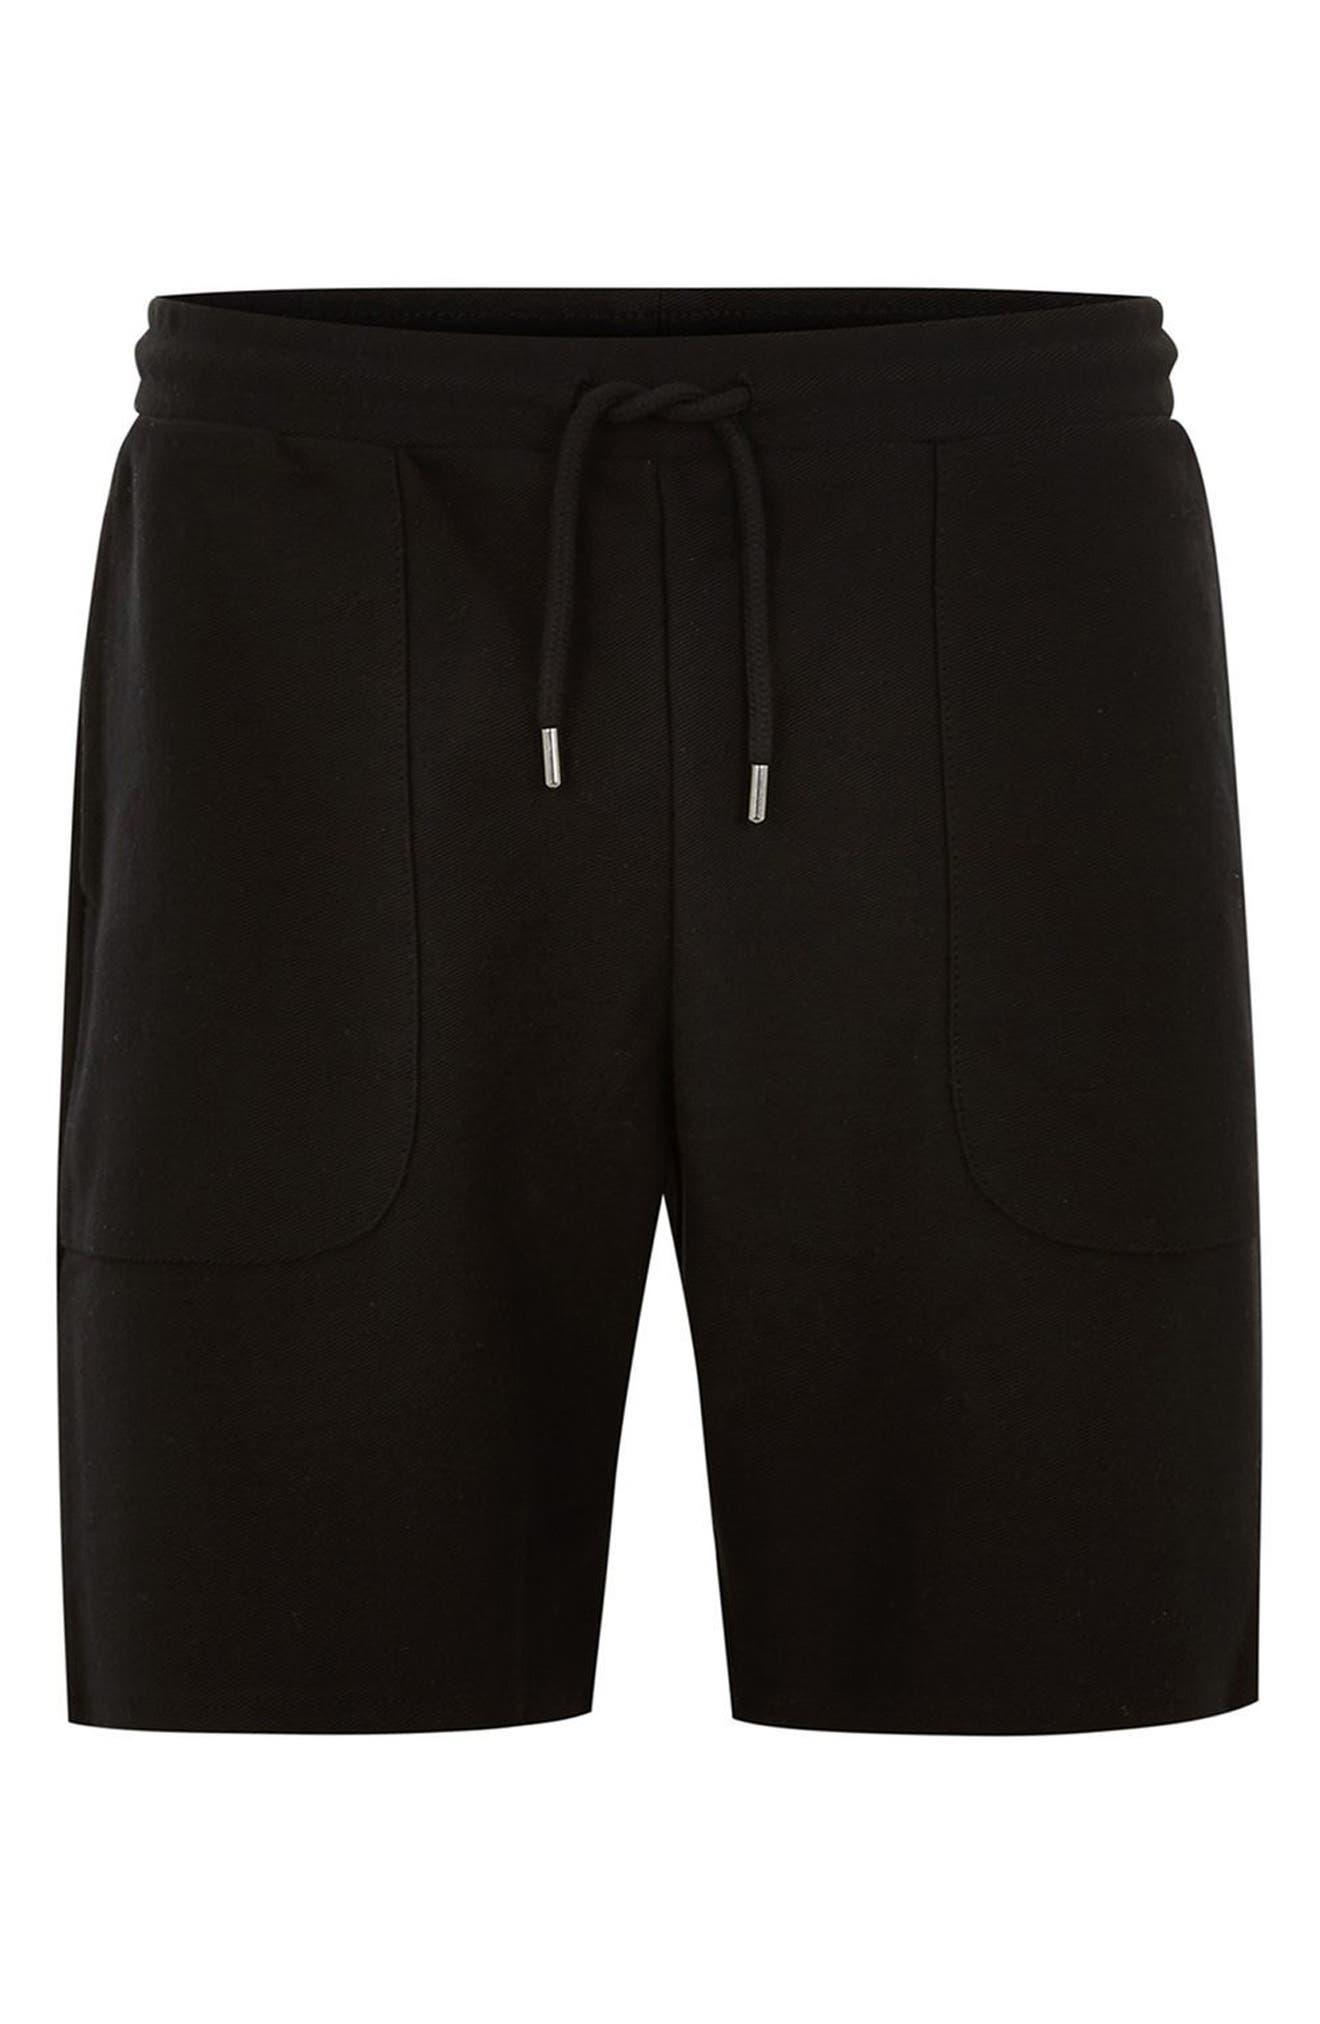 Slim Fit Twill Jersey Shorts,                             Alternate thumbnail 4, color,                             Black